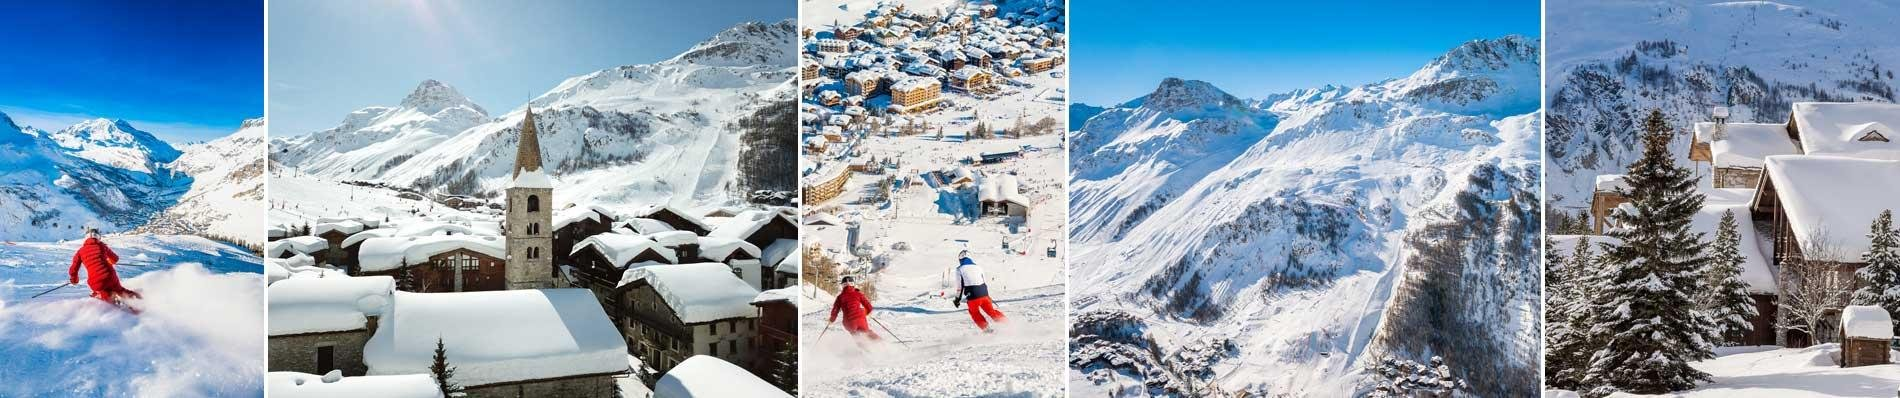 appartement val d'isere wintersport ski